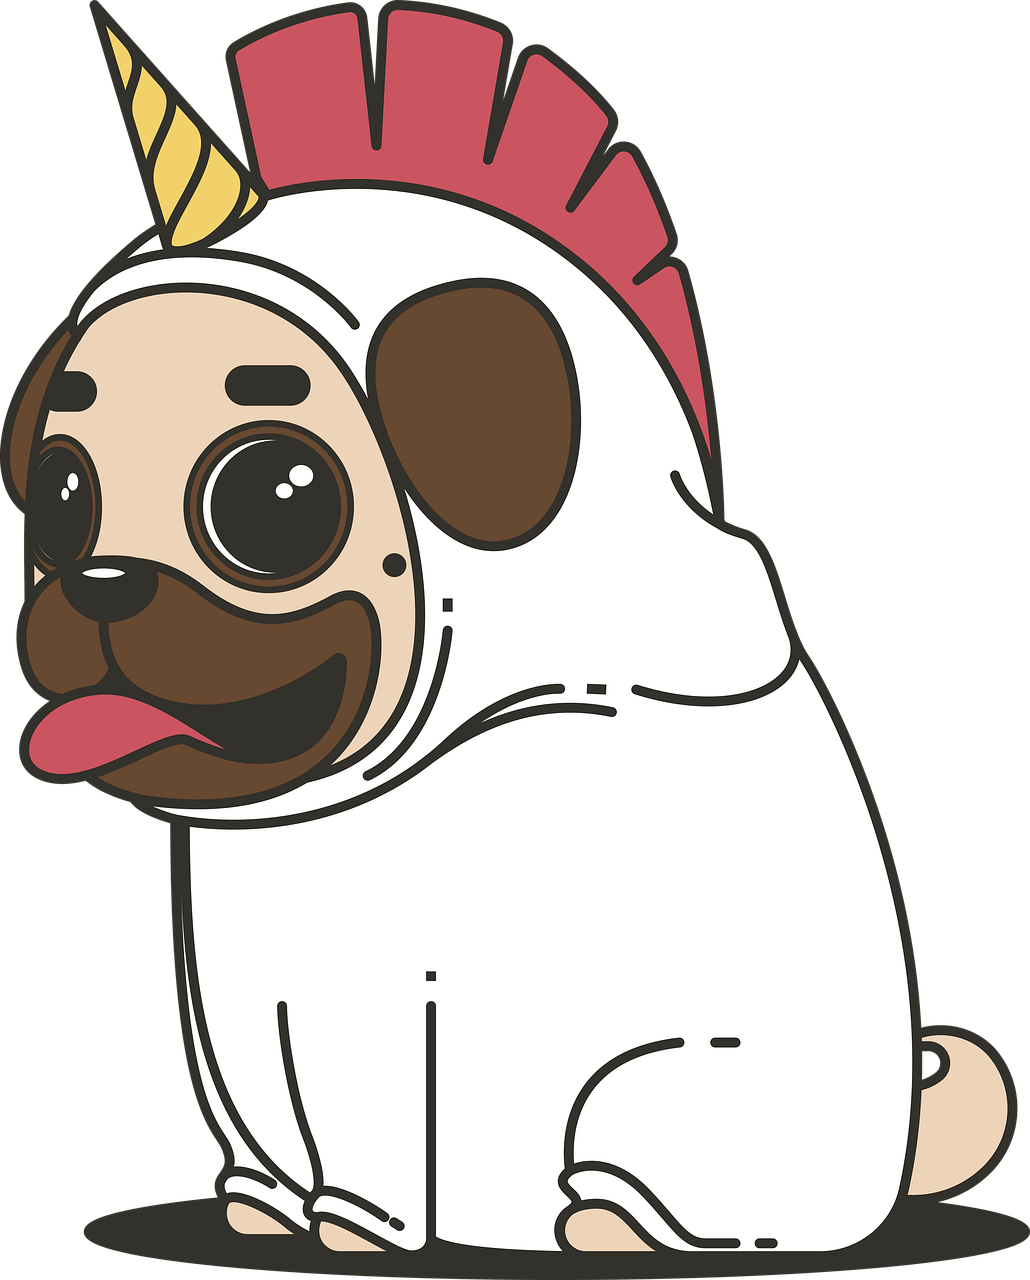 las mejores im u00e1genes de unicornios  animados  kawaii  mandalas  2018 French Bulldog Face Outline free clipart french bulldog